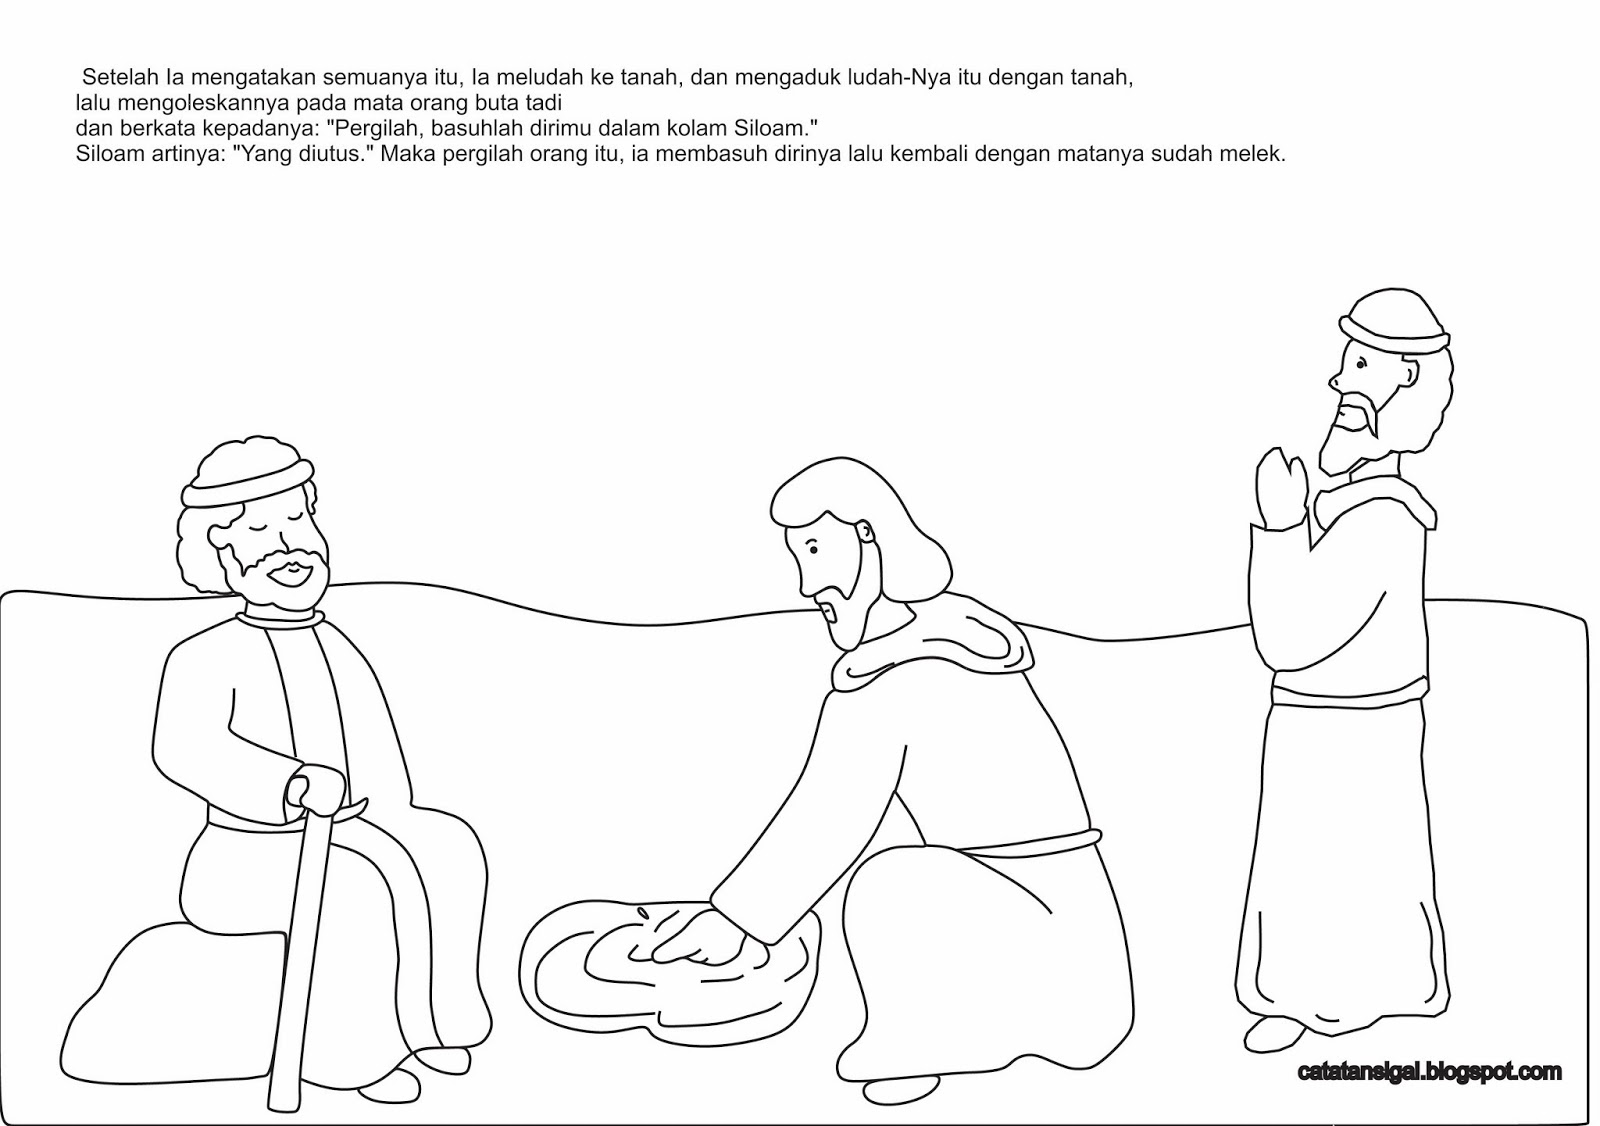 Catatan SiGal Mewarnai Gambar Yesus Menyembuhkan Orang Buta